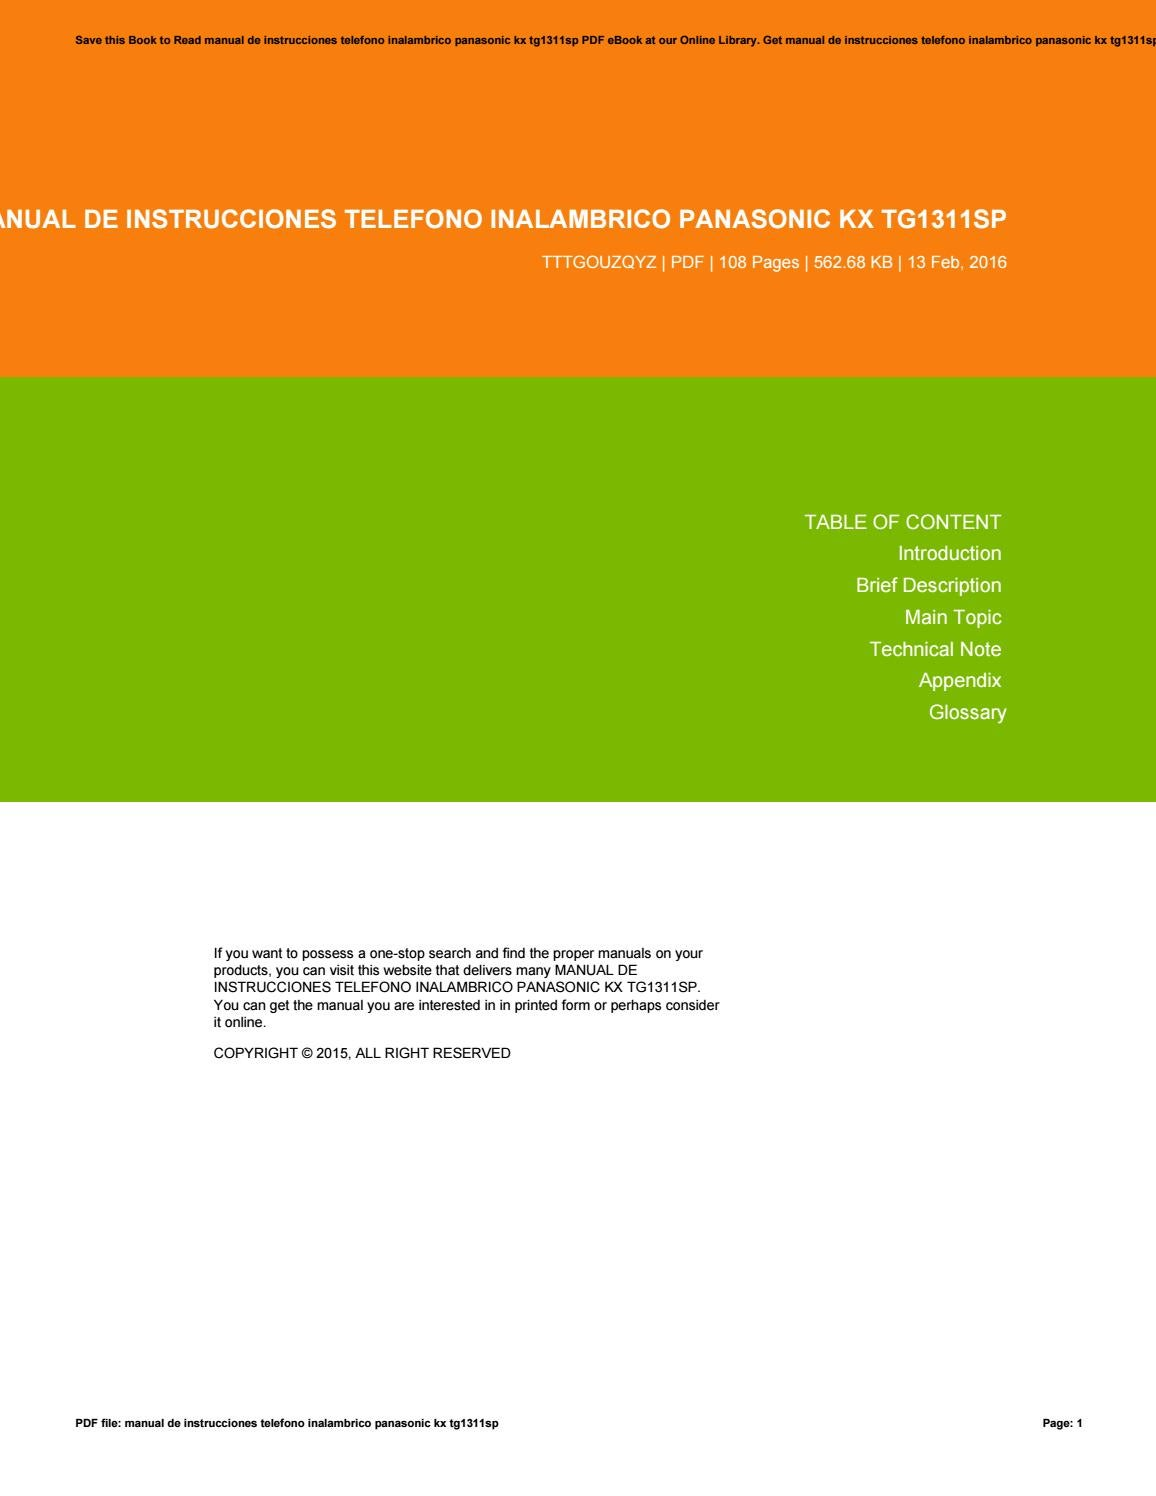 Manual de instrucciones telefono inalambrico panasonic kx tg1311sp by  KathrynPugh4897 - issuu